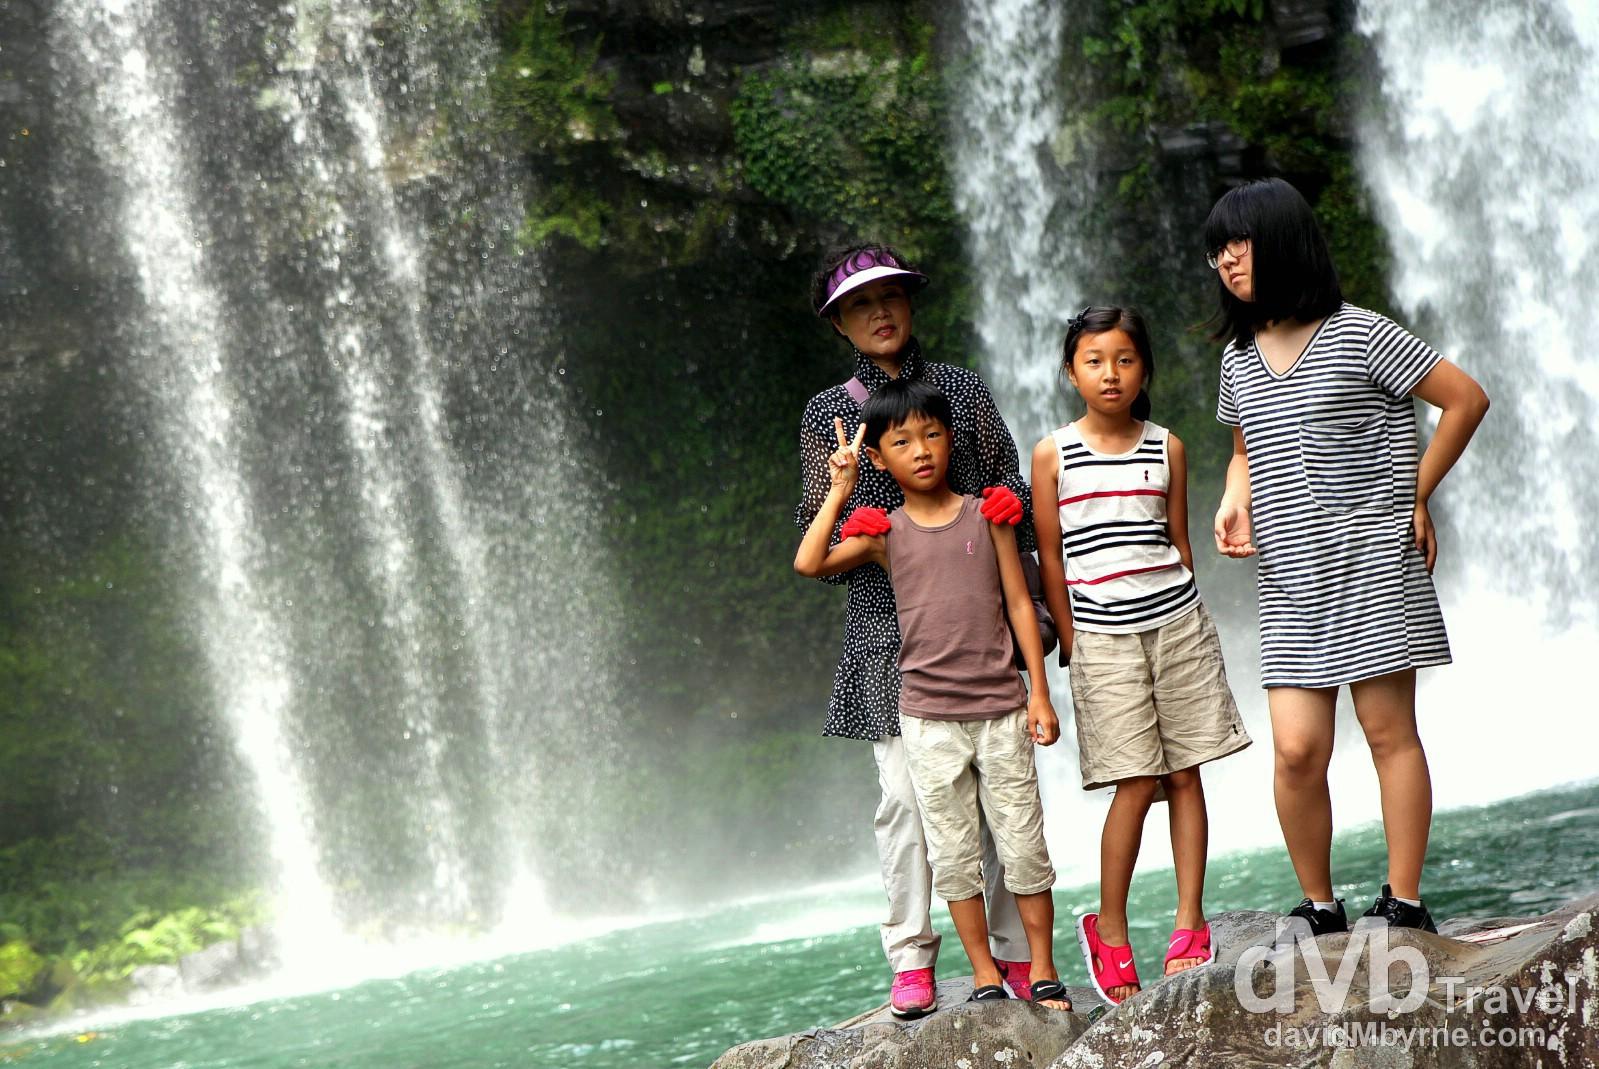 Cheonjiyeon Waterfall, Jeju-do, South Korea. July 16th, 2011